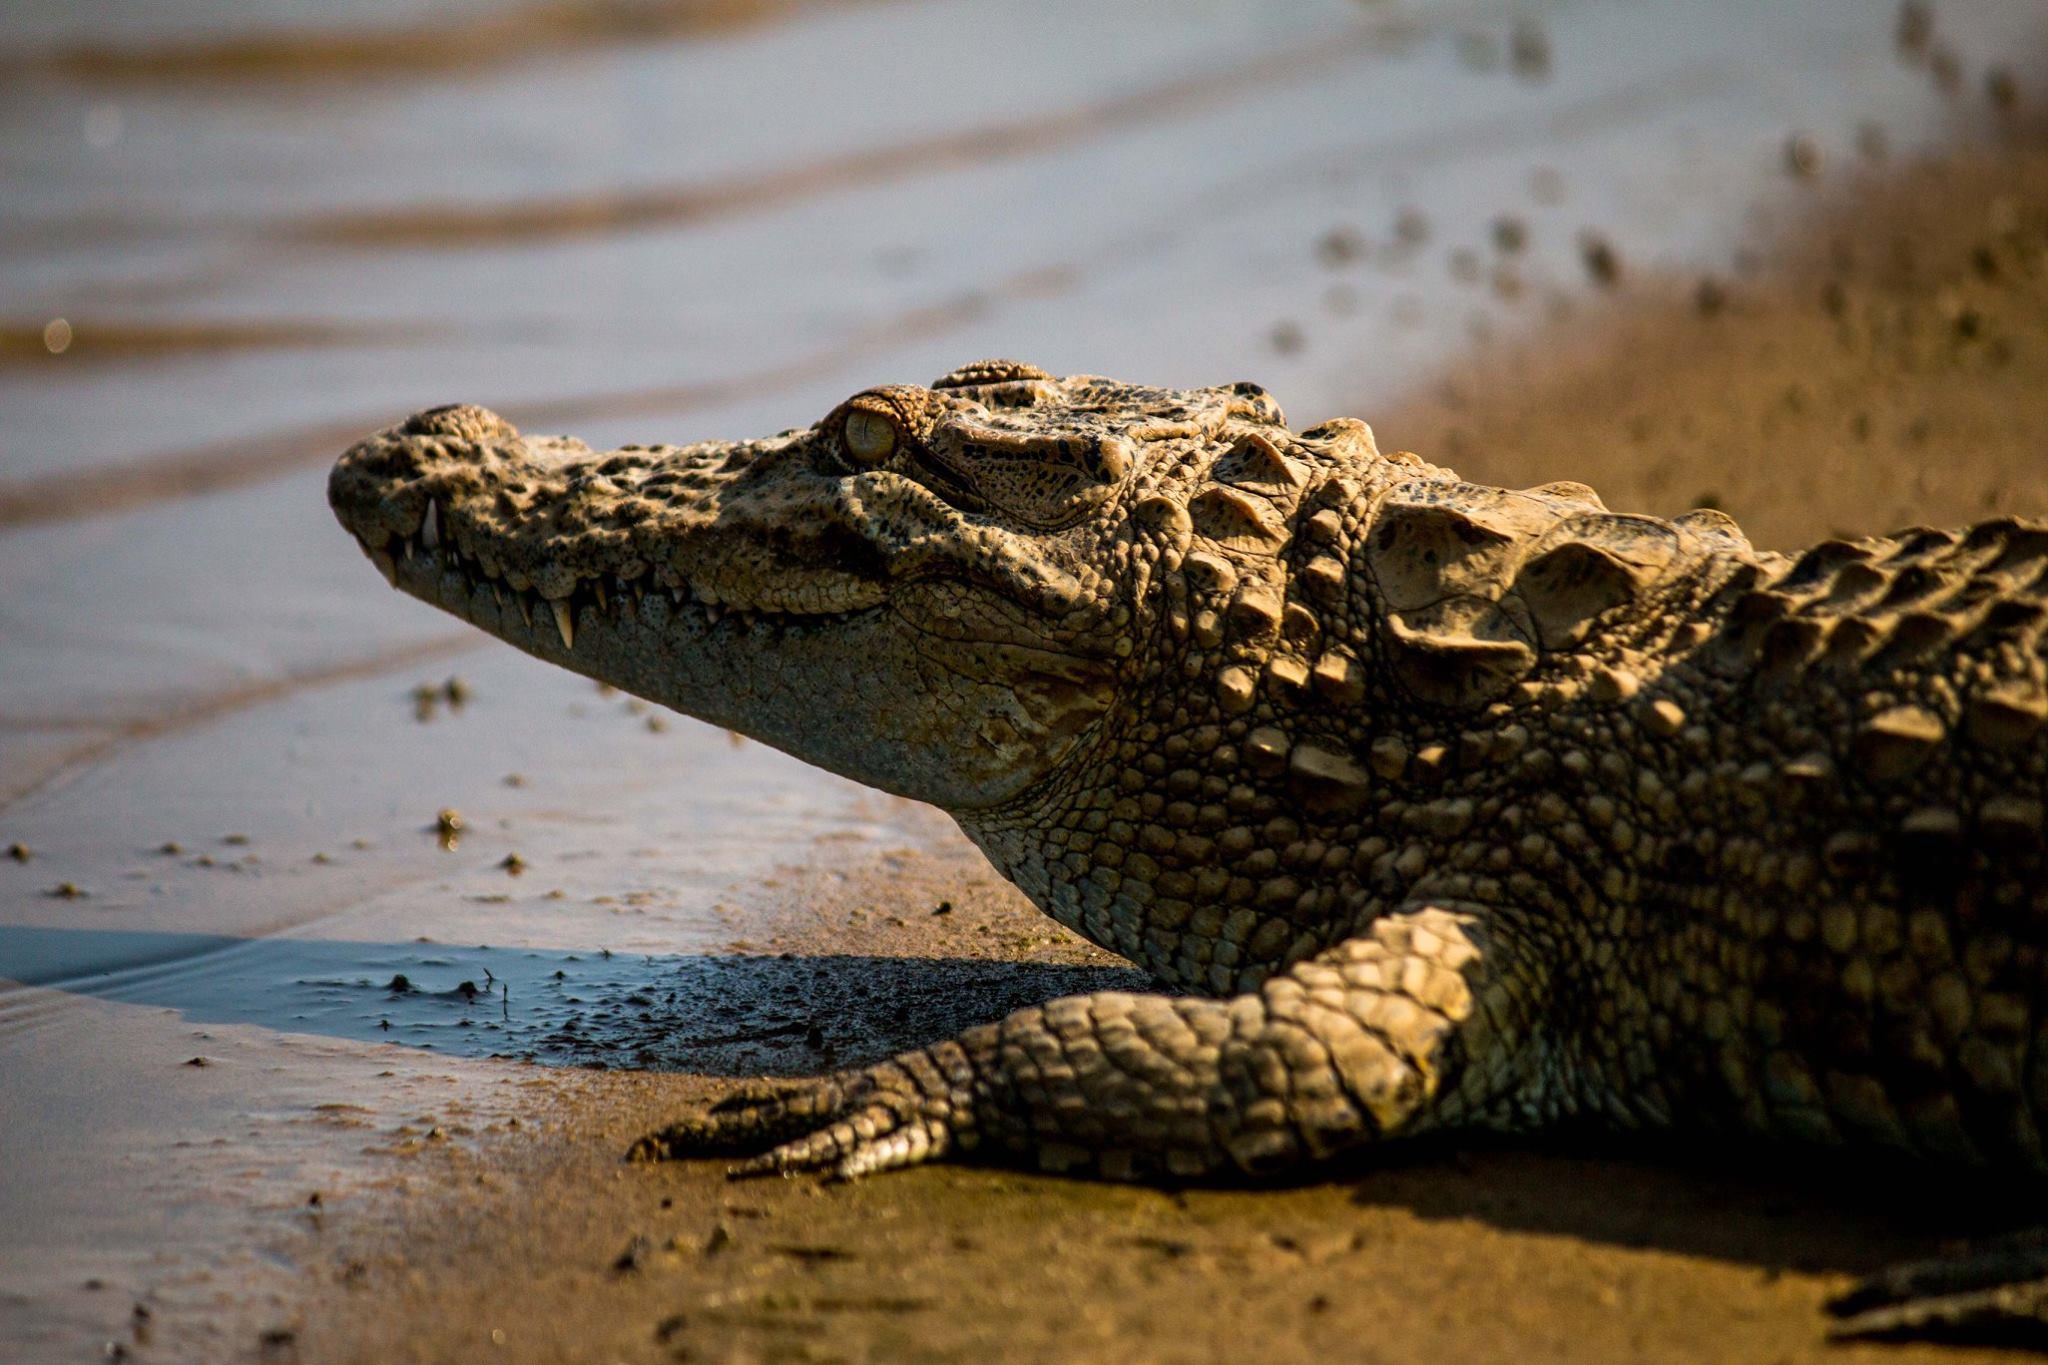 invite-to-paradise-sri-lanka-and-maldives-specialists-travel-agent-tour-operator-customer-review-feedback-joel-rhian-crocodile-4.jpg